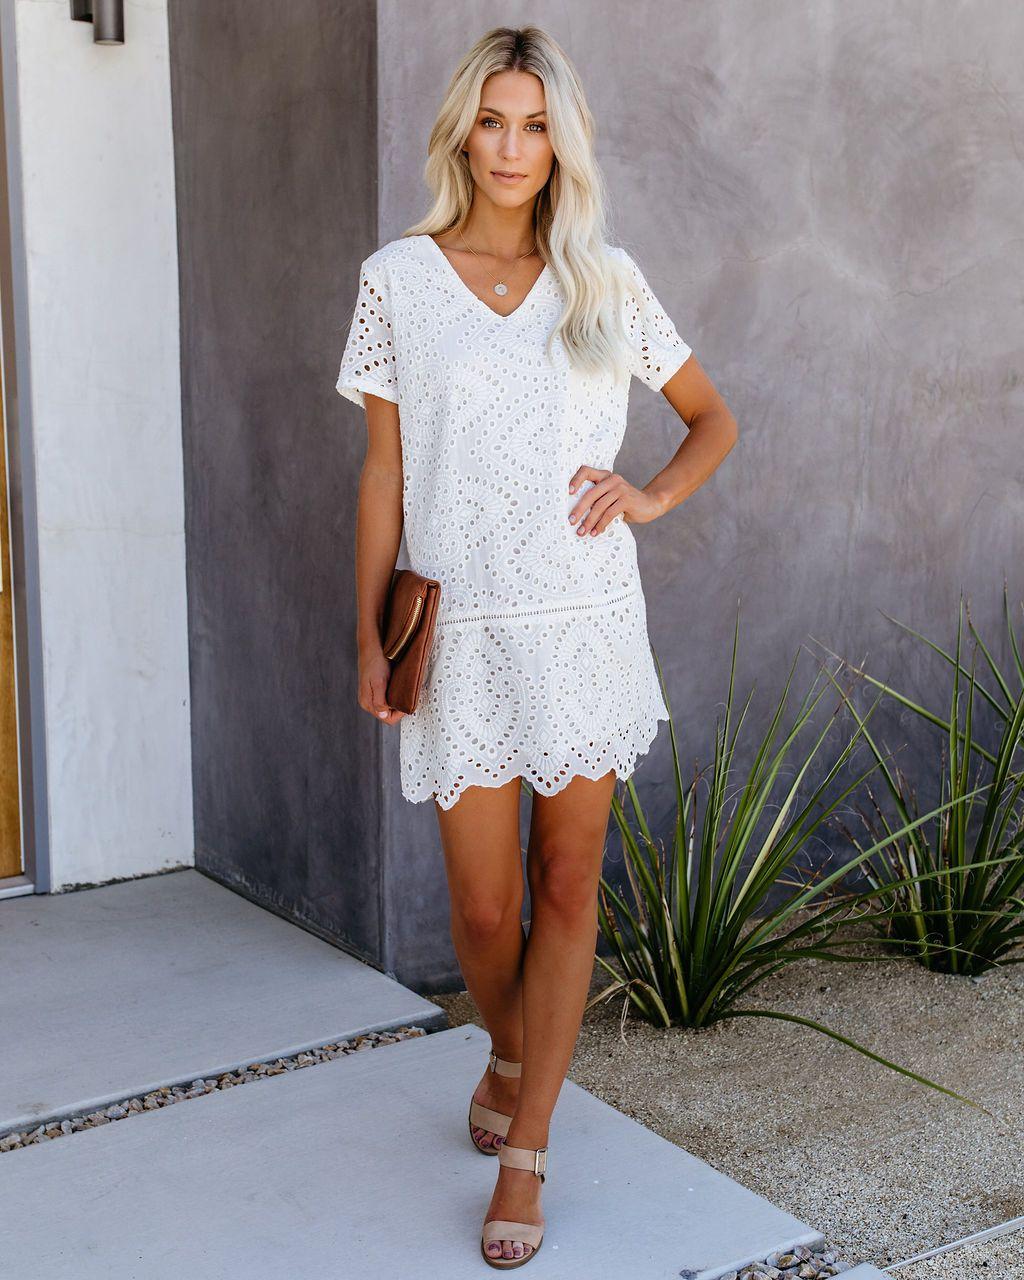 Don T Be Salty Cotton Eyelet Shift Dress Dresses Shift Dress Little White Dresses [ 1280 x 1024 Pixel ]